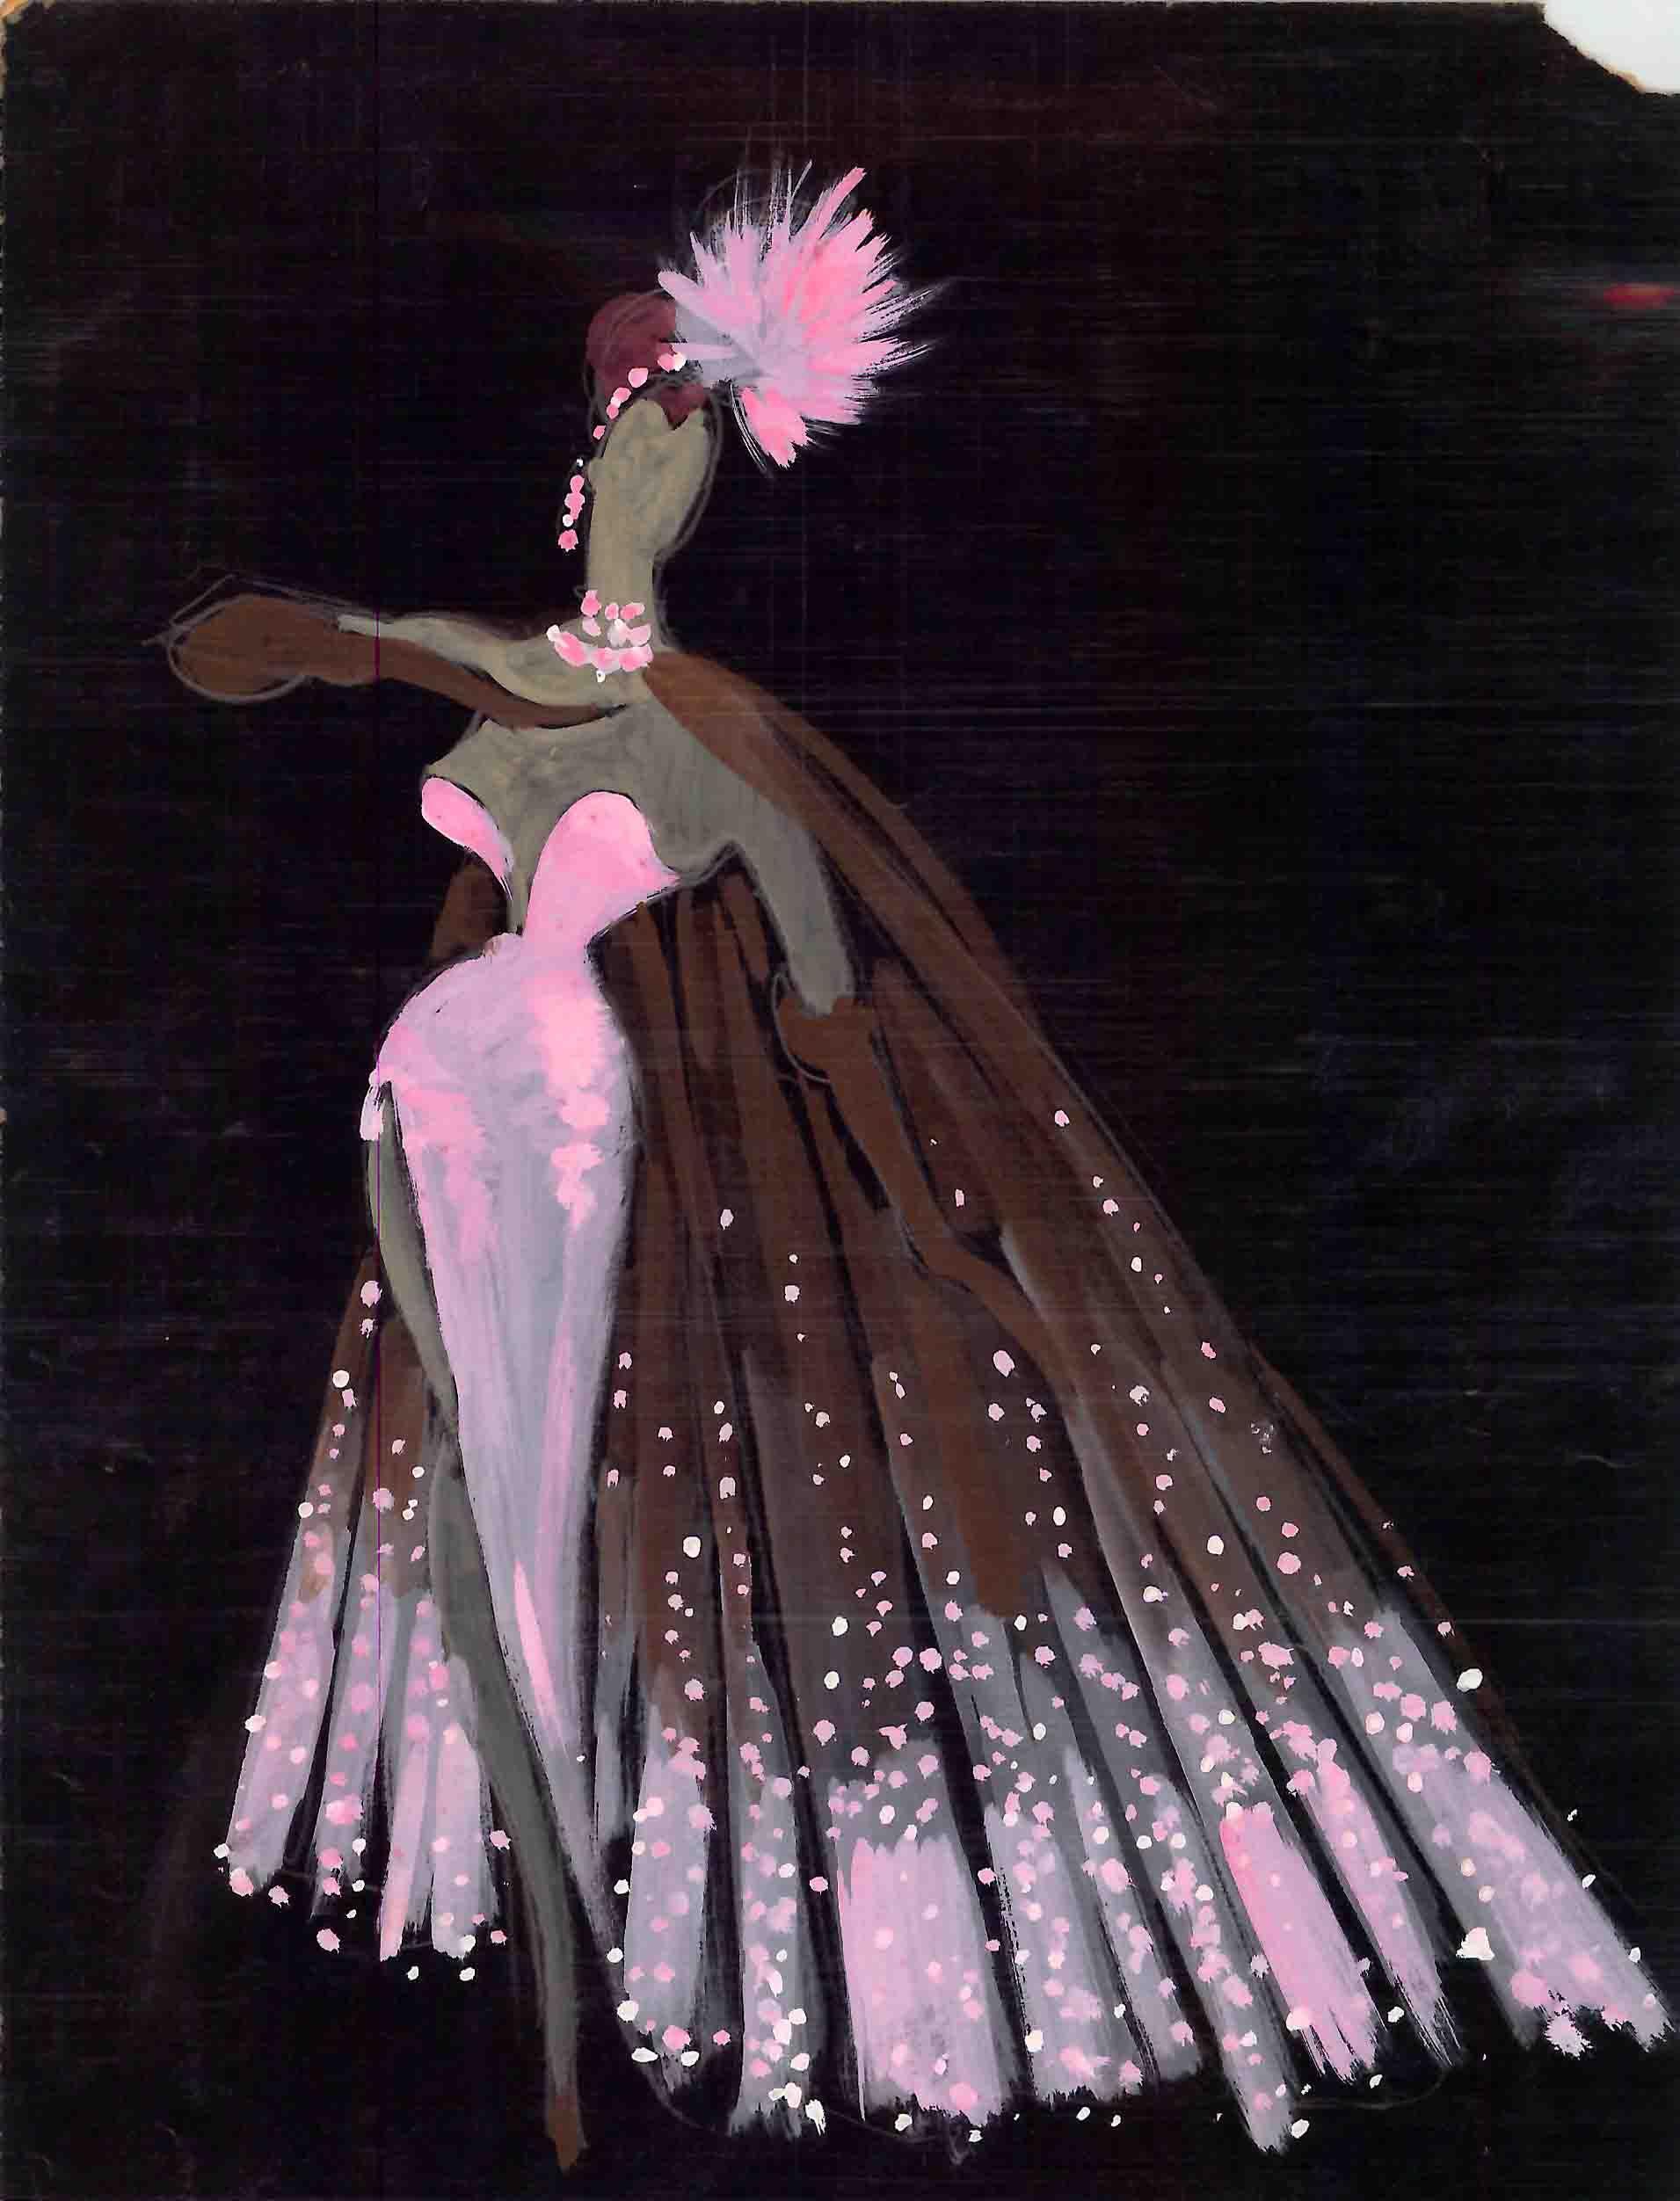 Showgirls Costumes Amp Designs On Pinterest Costume